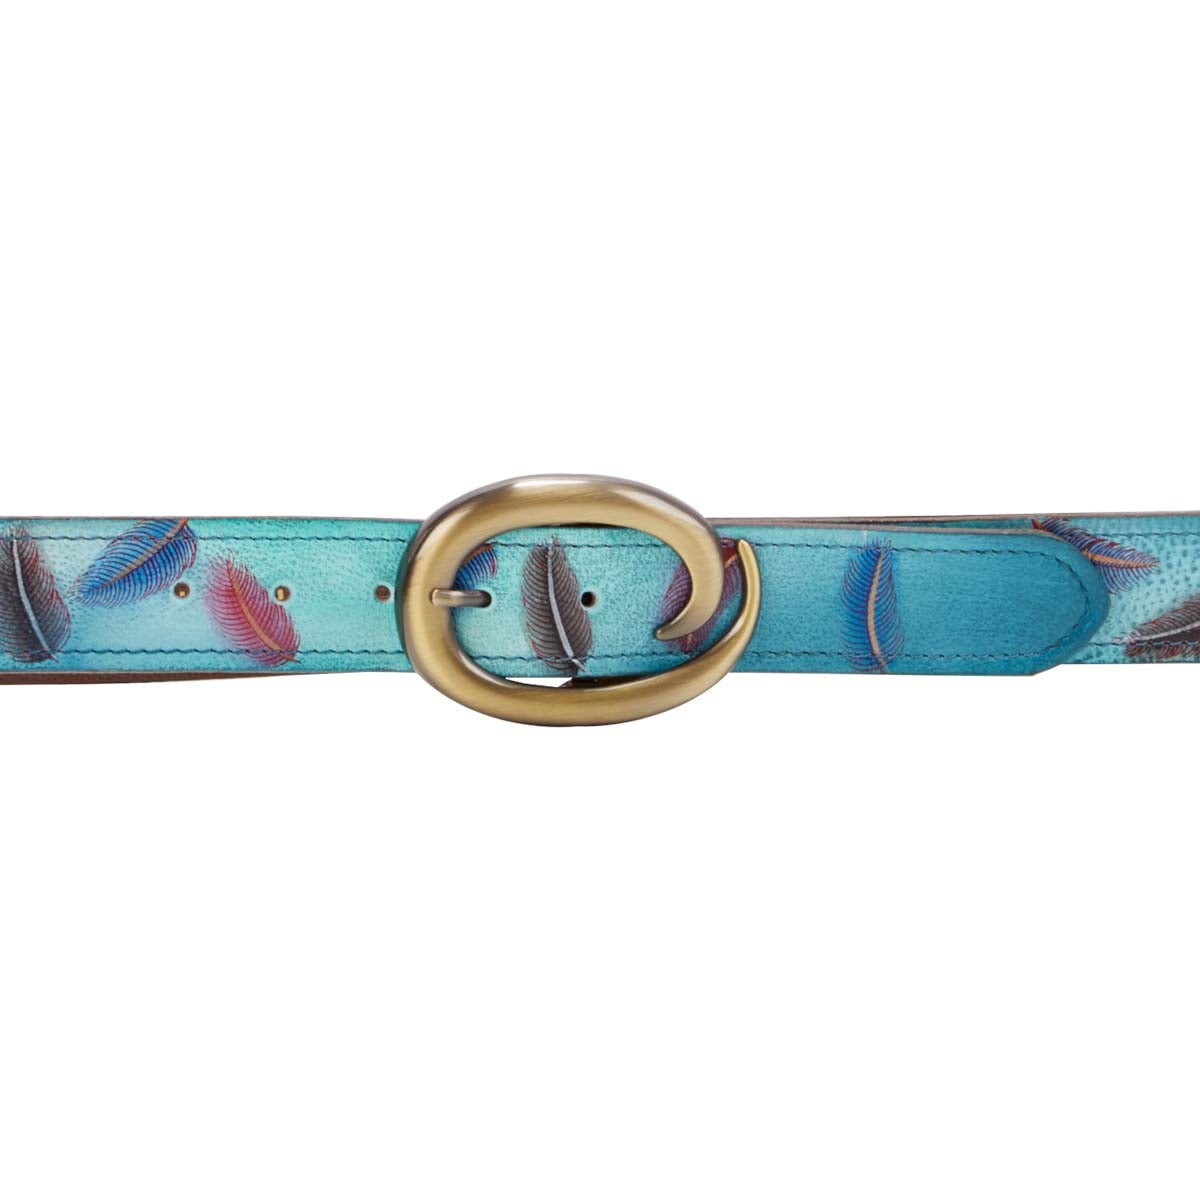 Painted lthr Floating Feathers adj belt